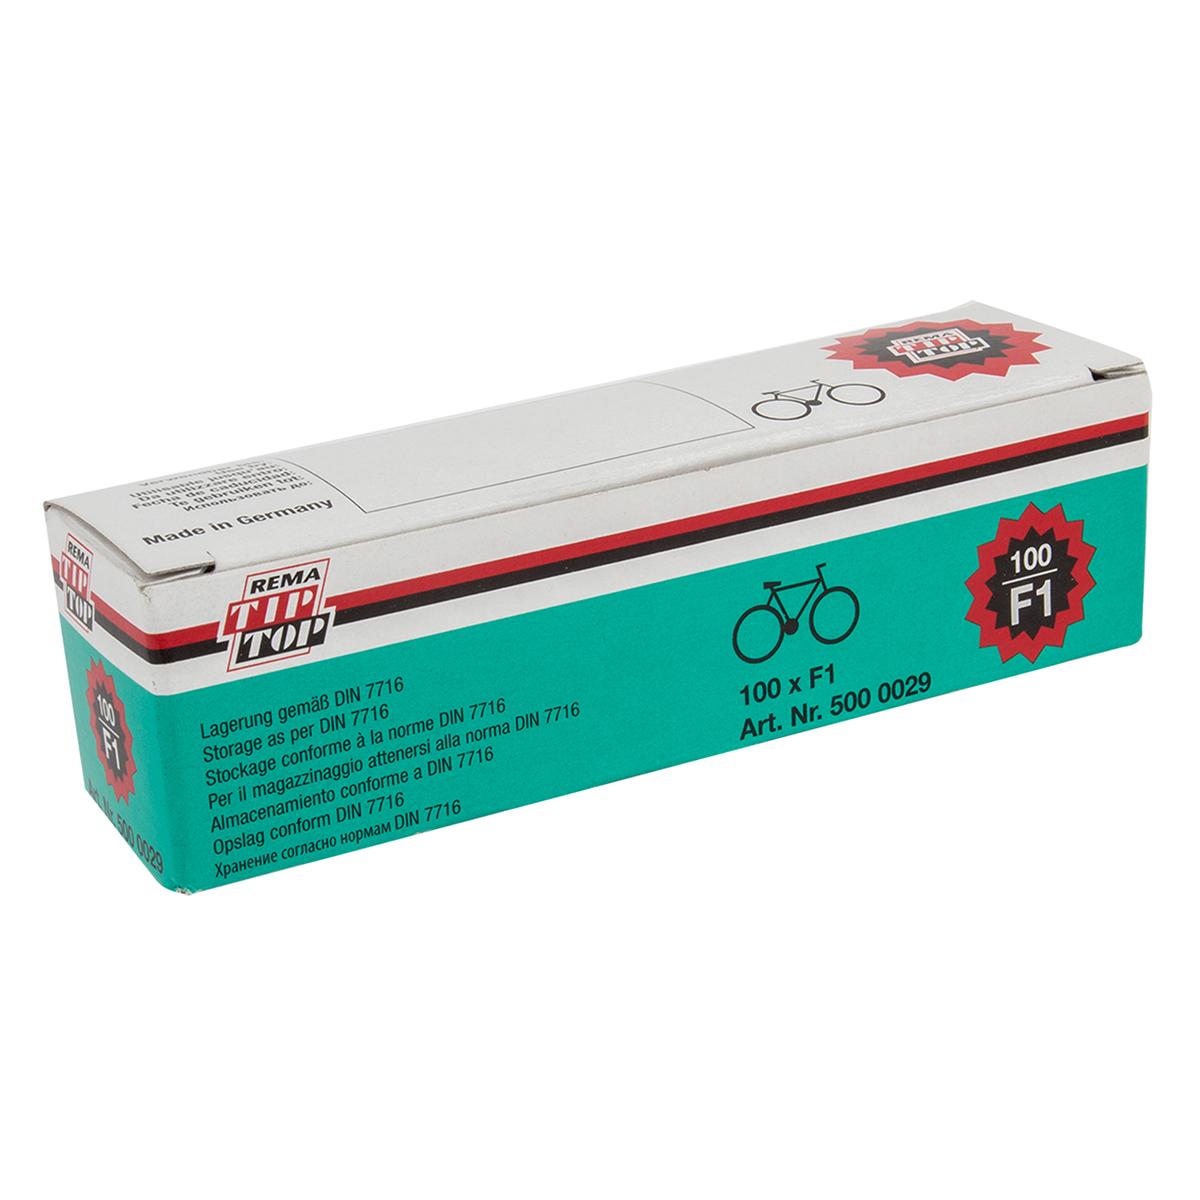 Rema, Round Patch 25 mm Box of 100